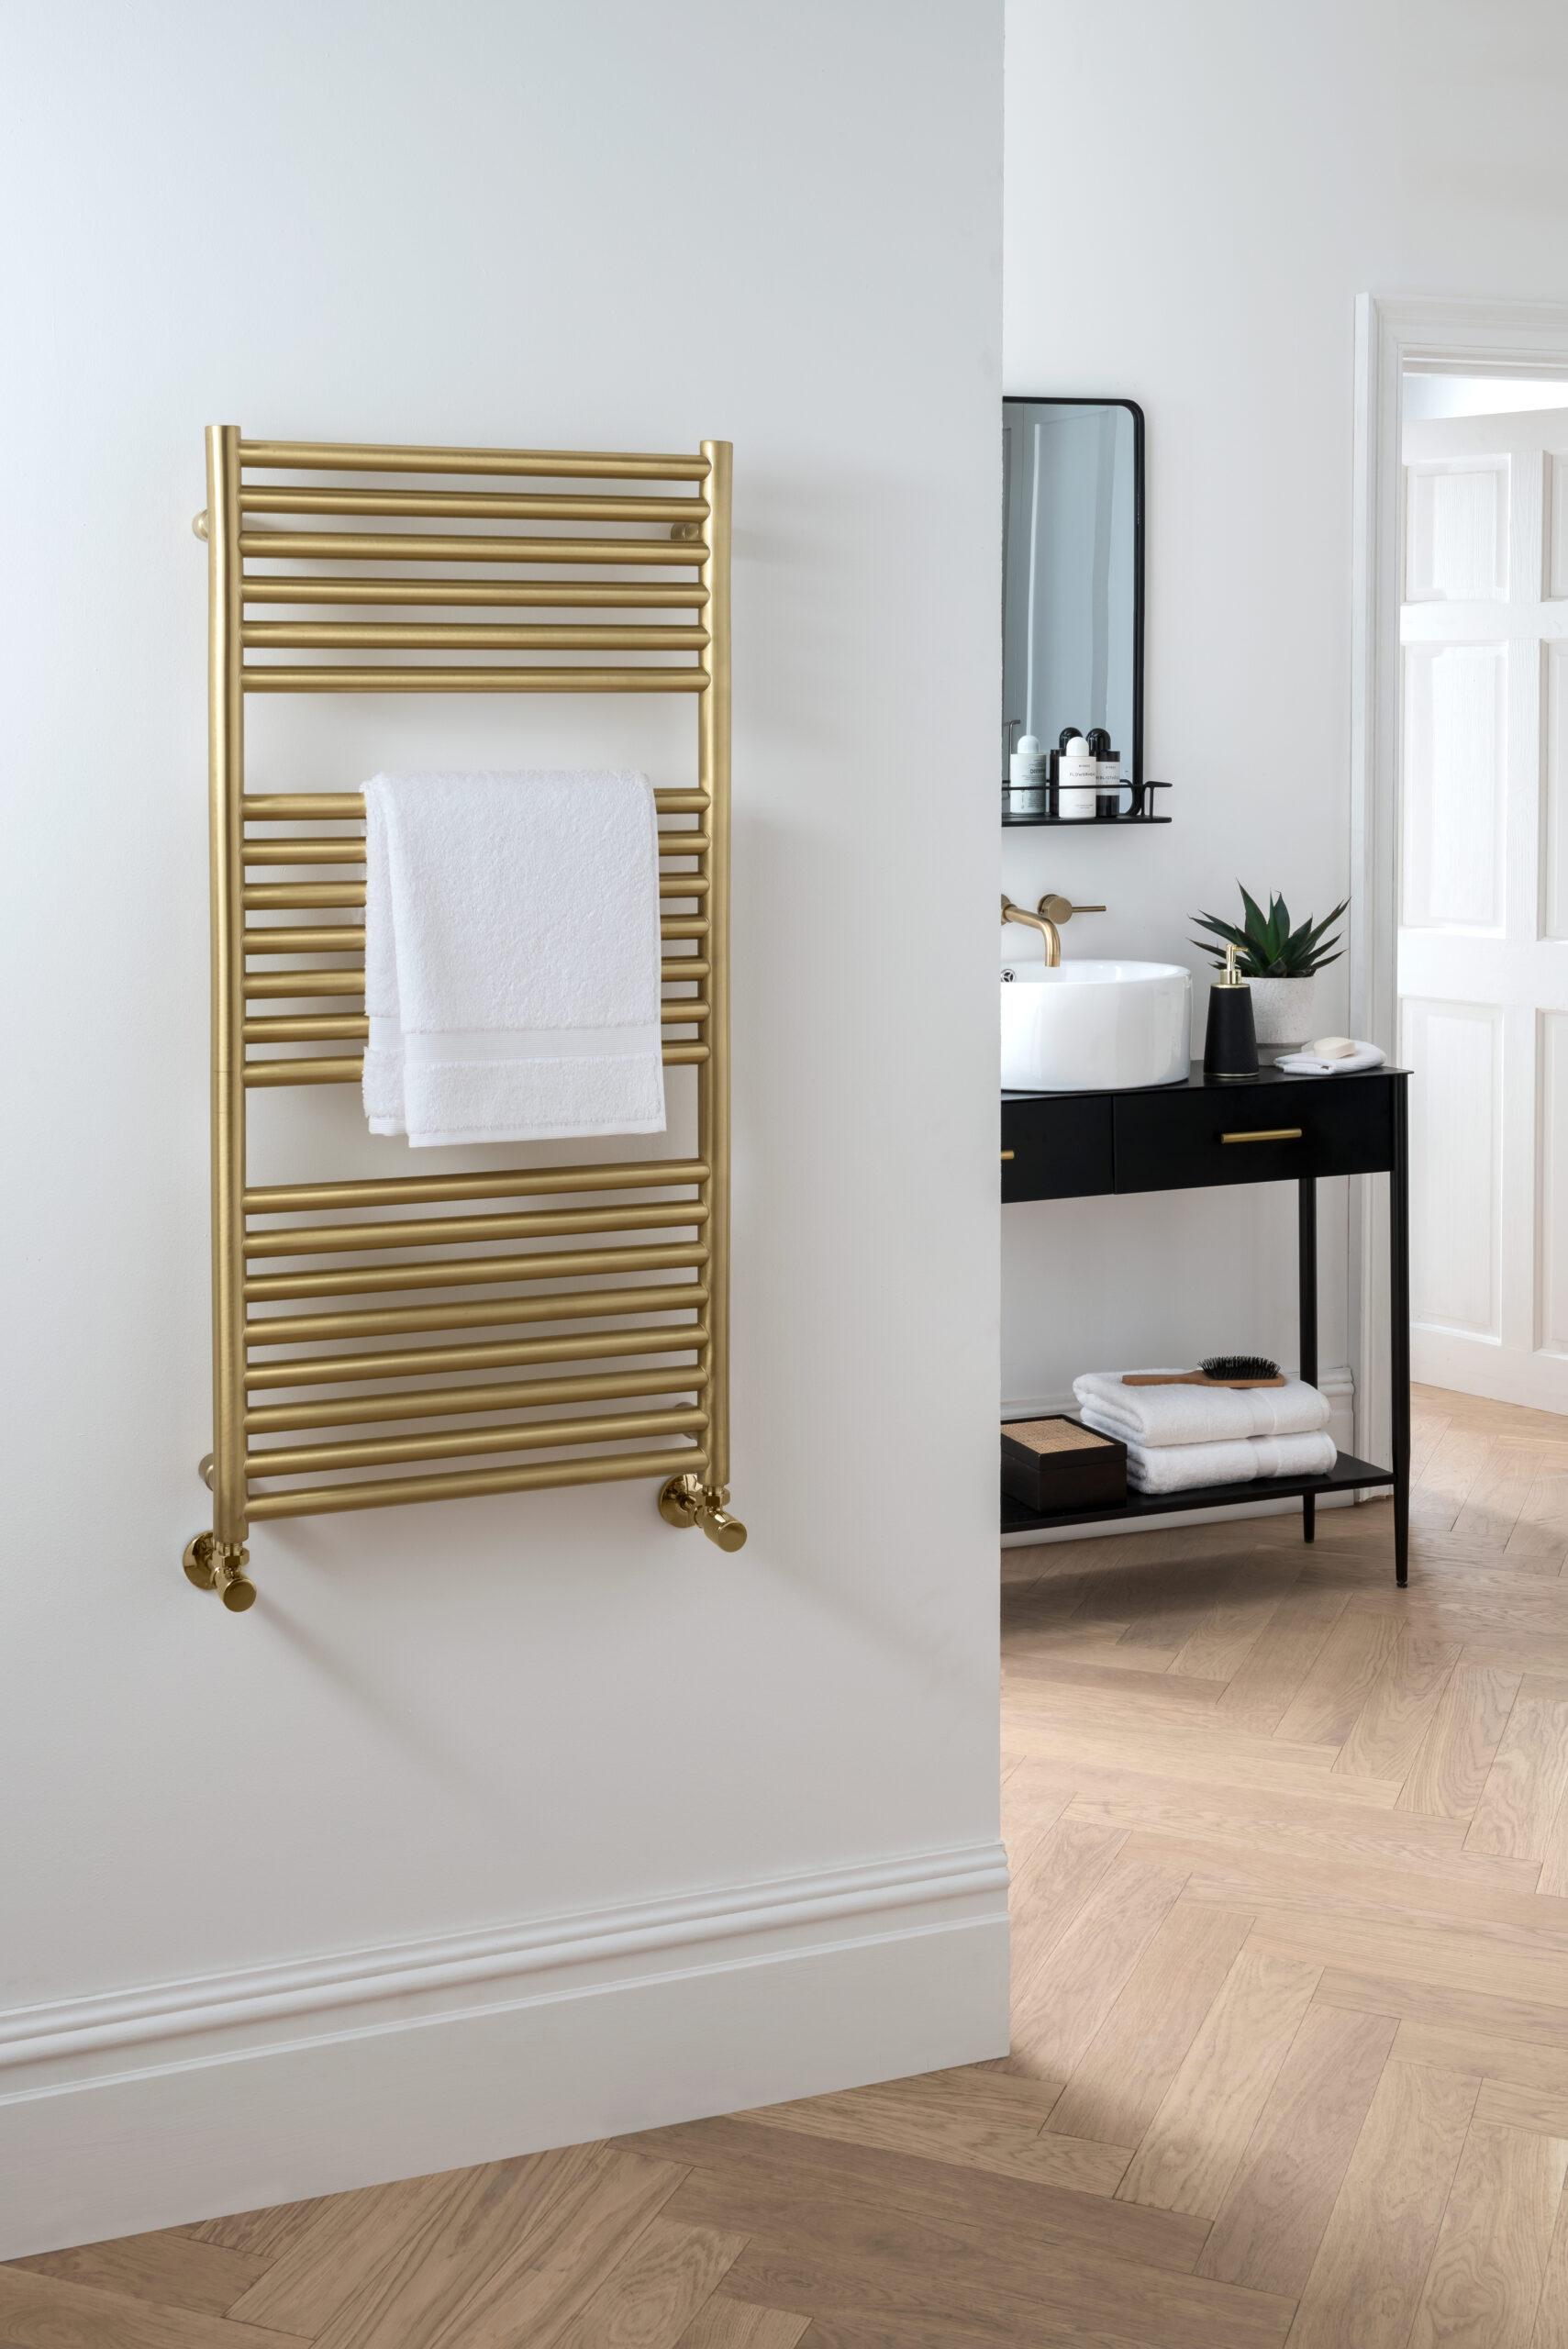 _Studio MD006 Brushed Brass by Vogue (UK) – HR